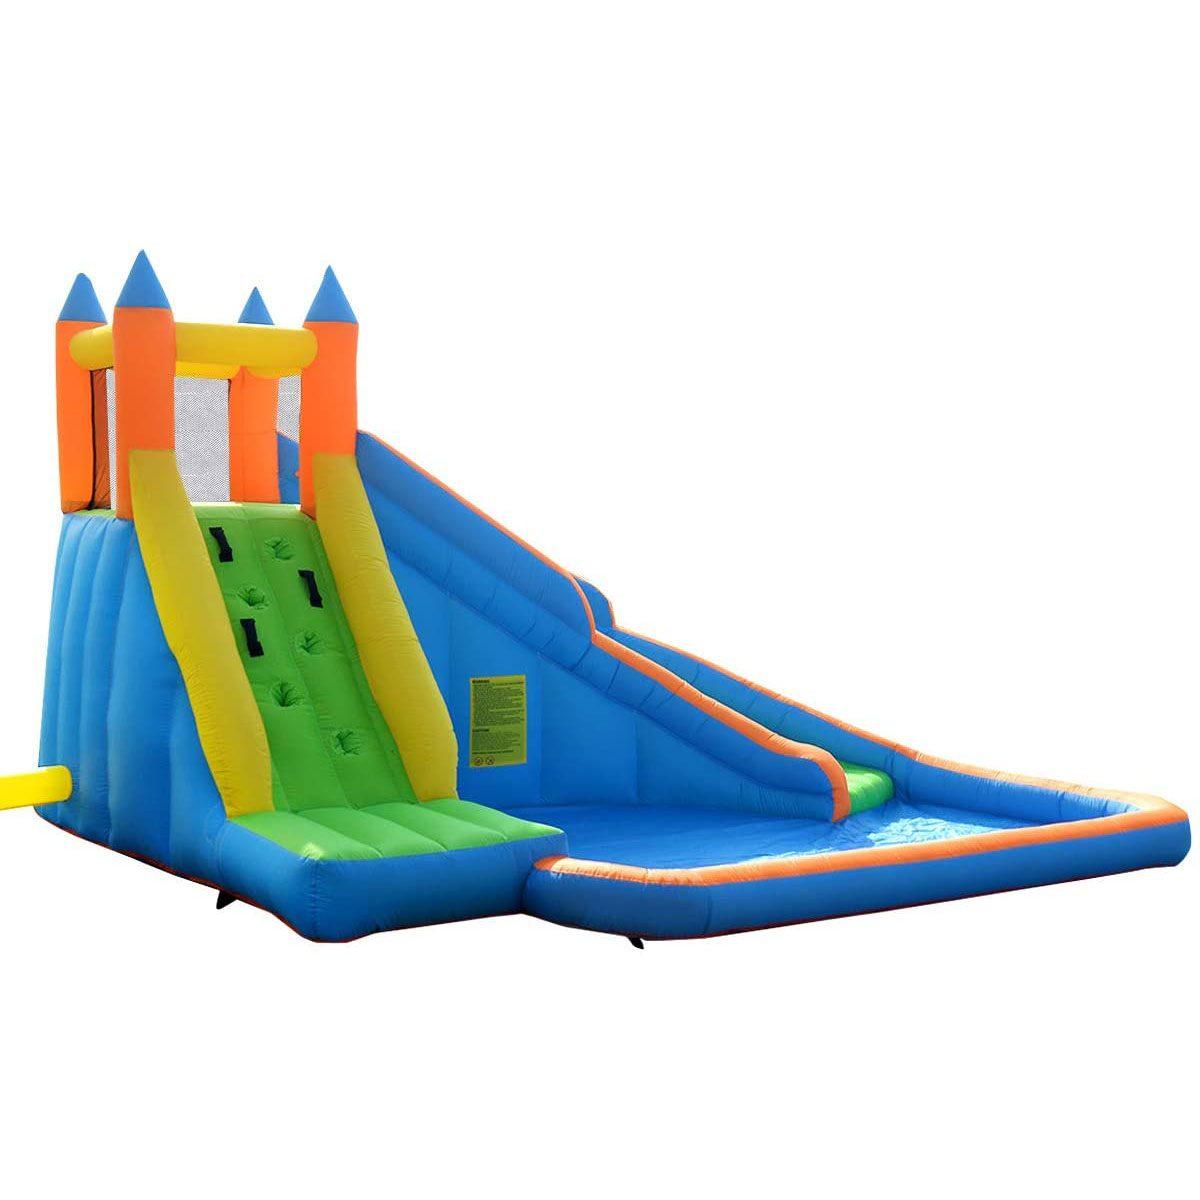 Kiddie pool with castle bouncy house